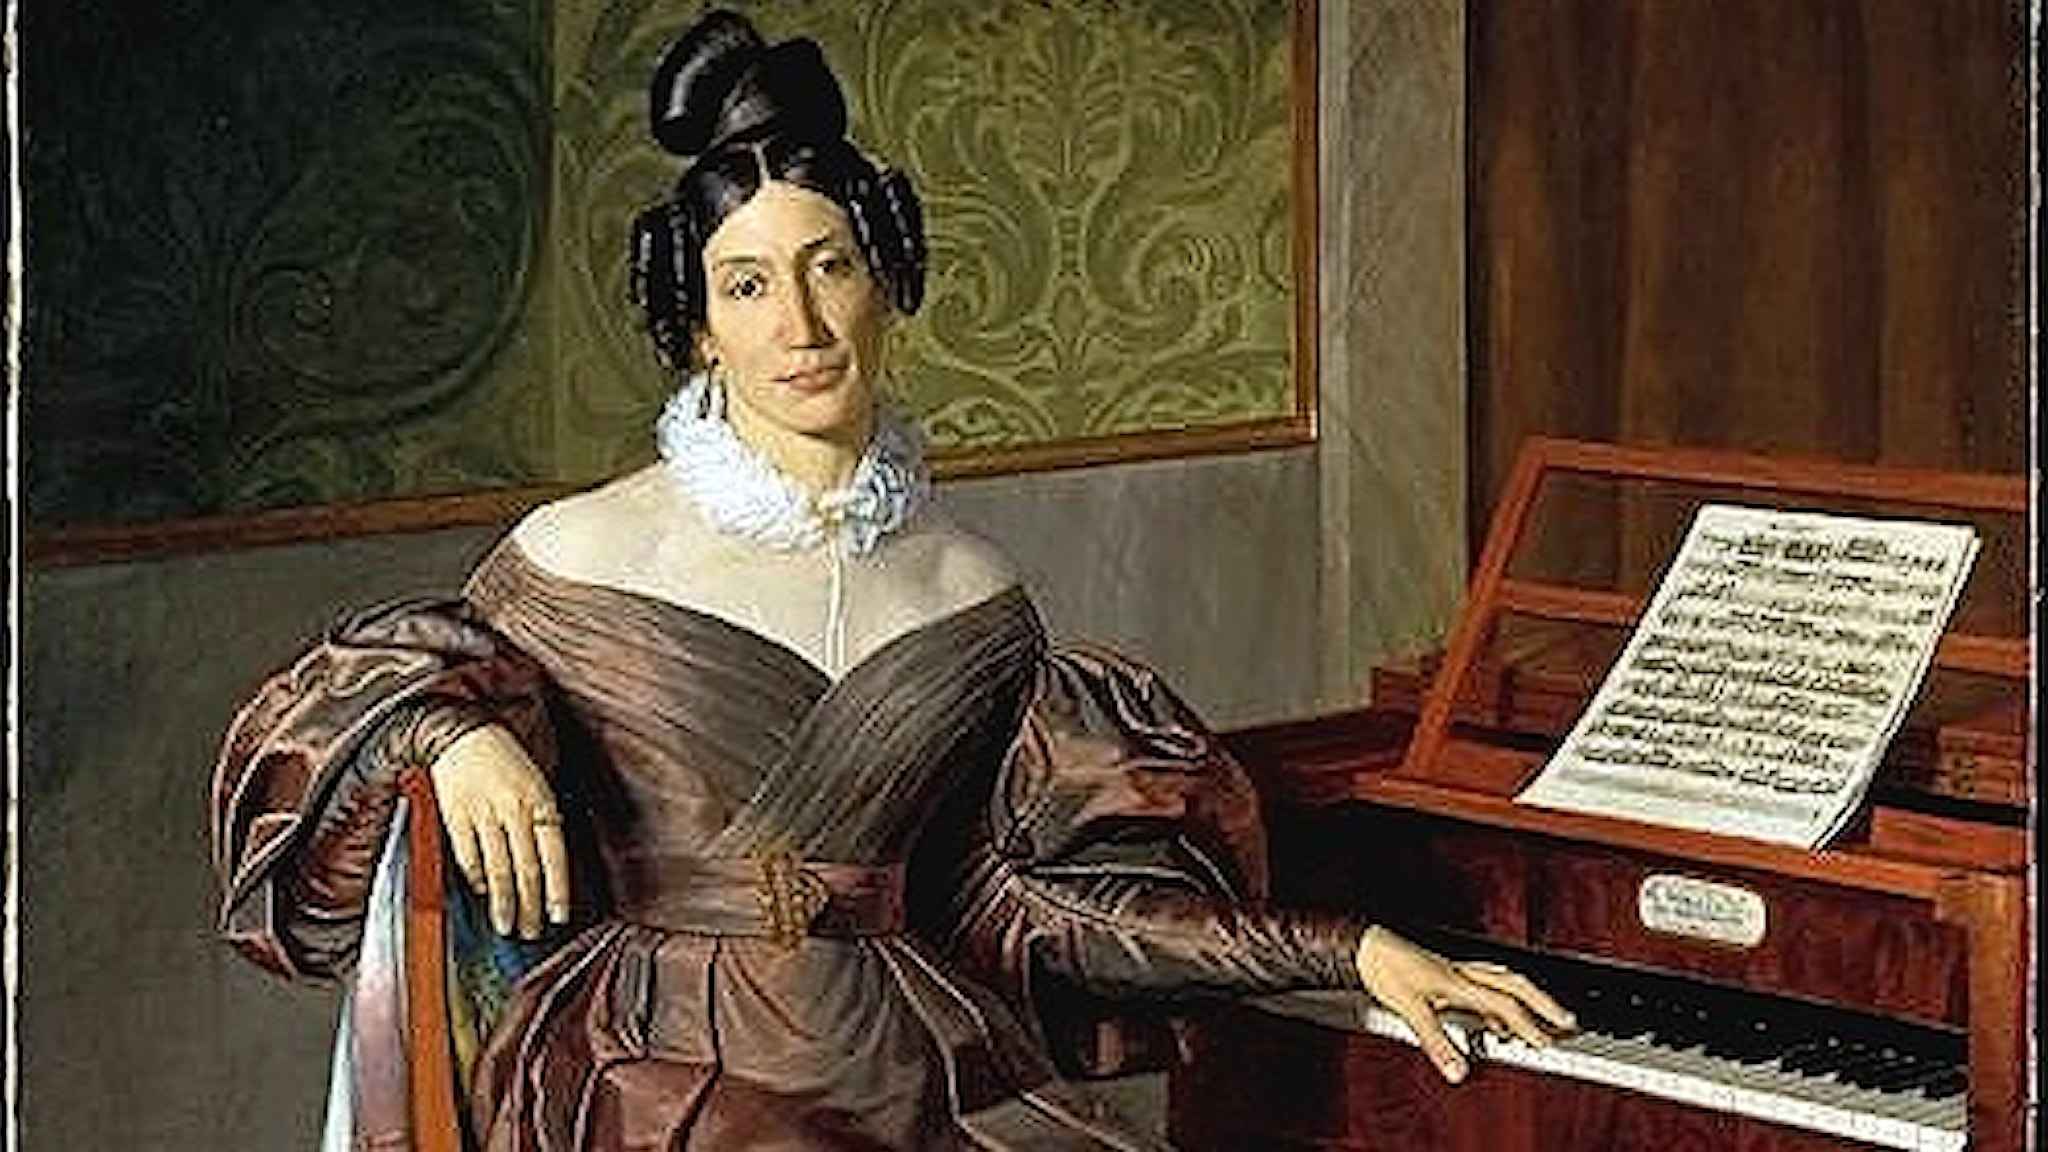 Isabella Colbran (Johann Baptist Reiter, ca 1835).